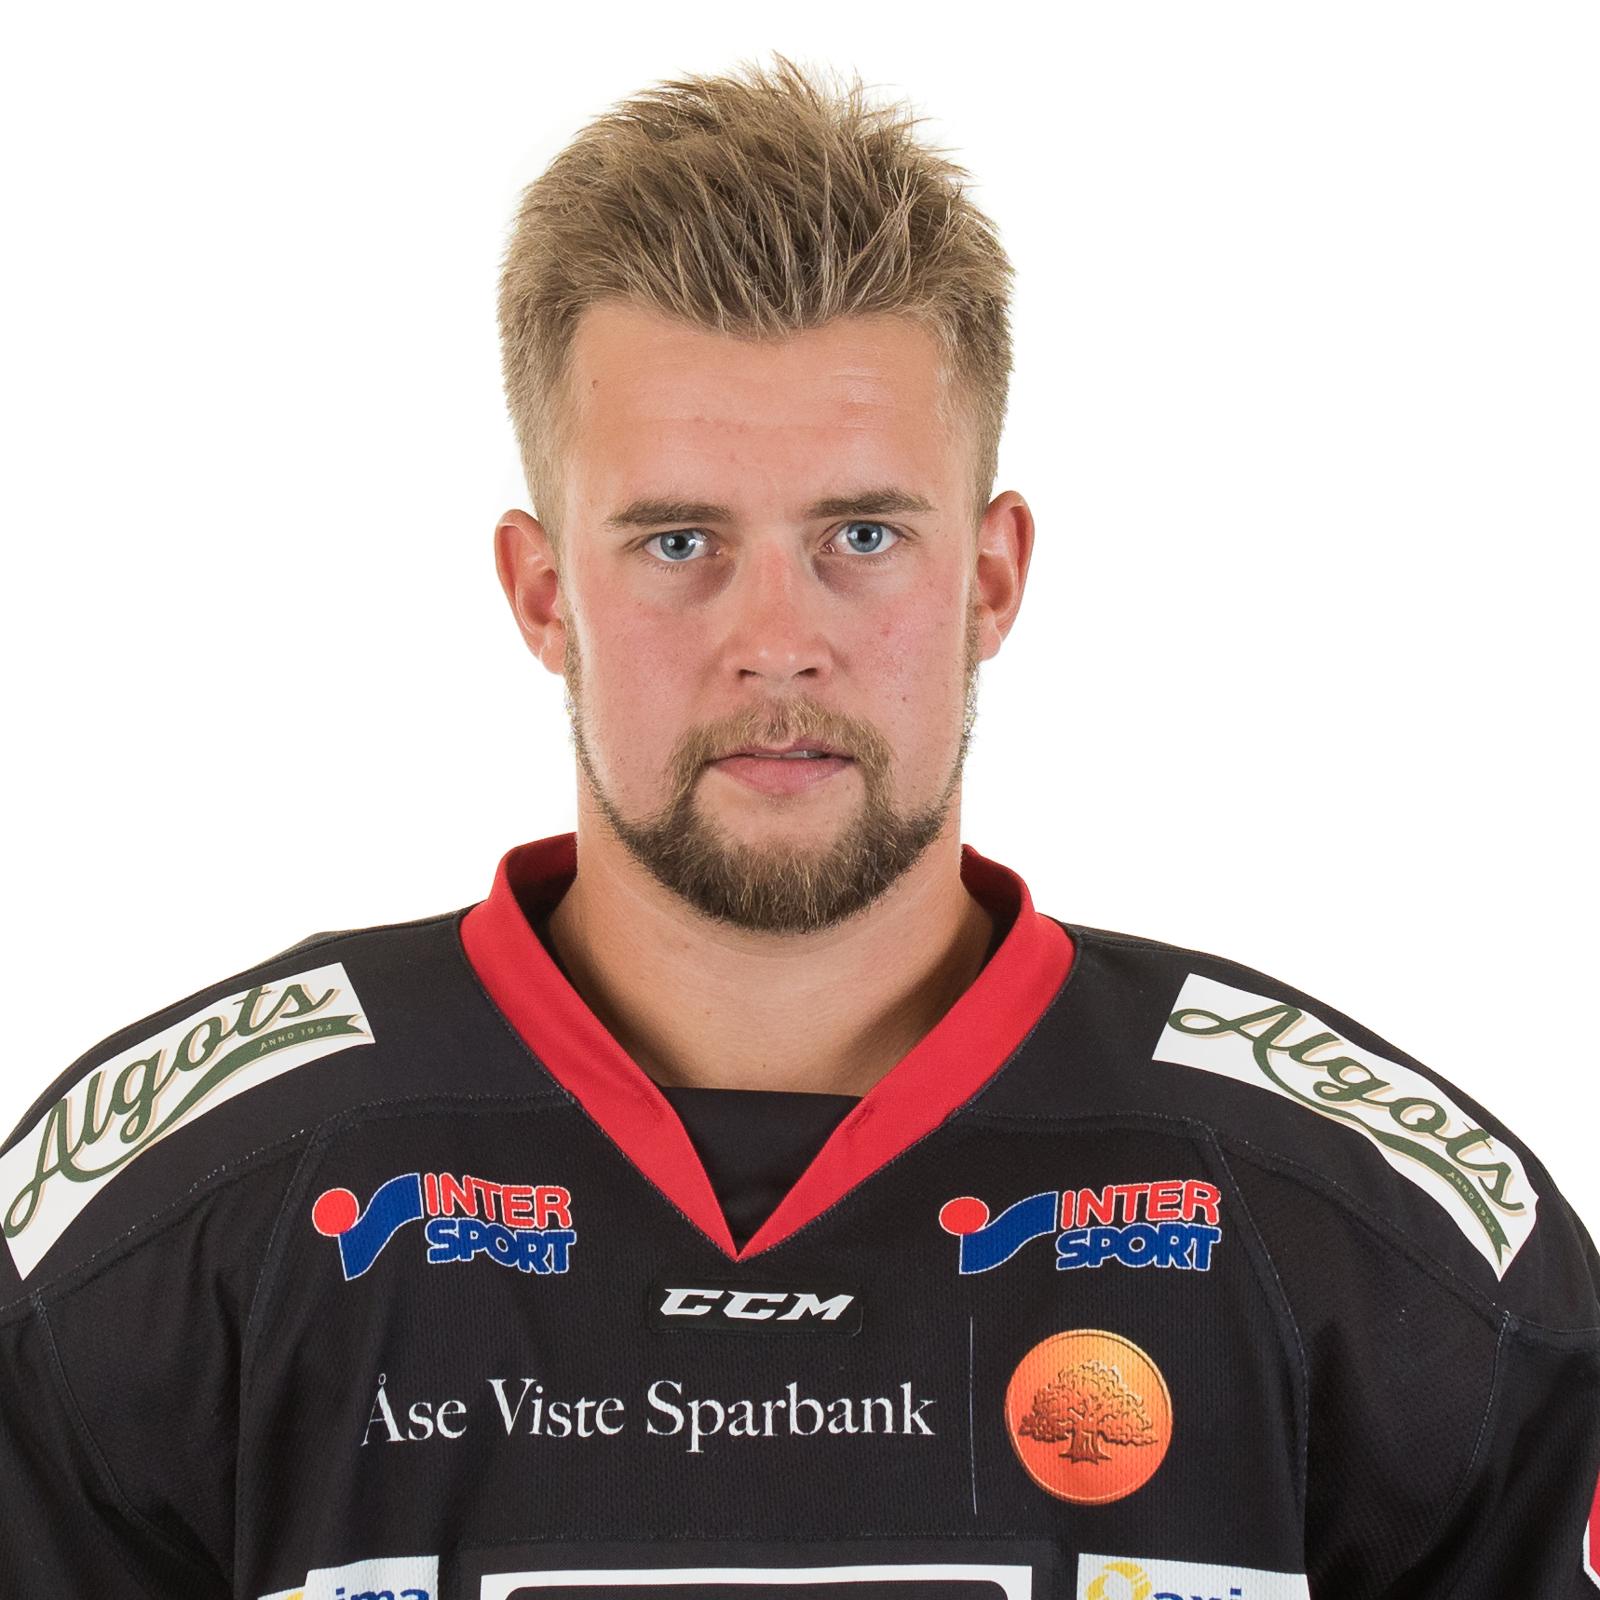 Joel Nyberg